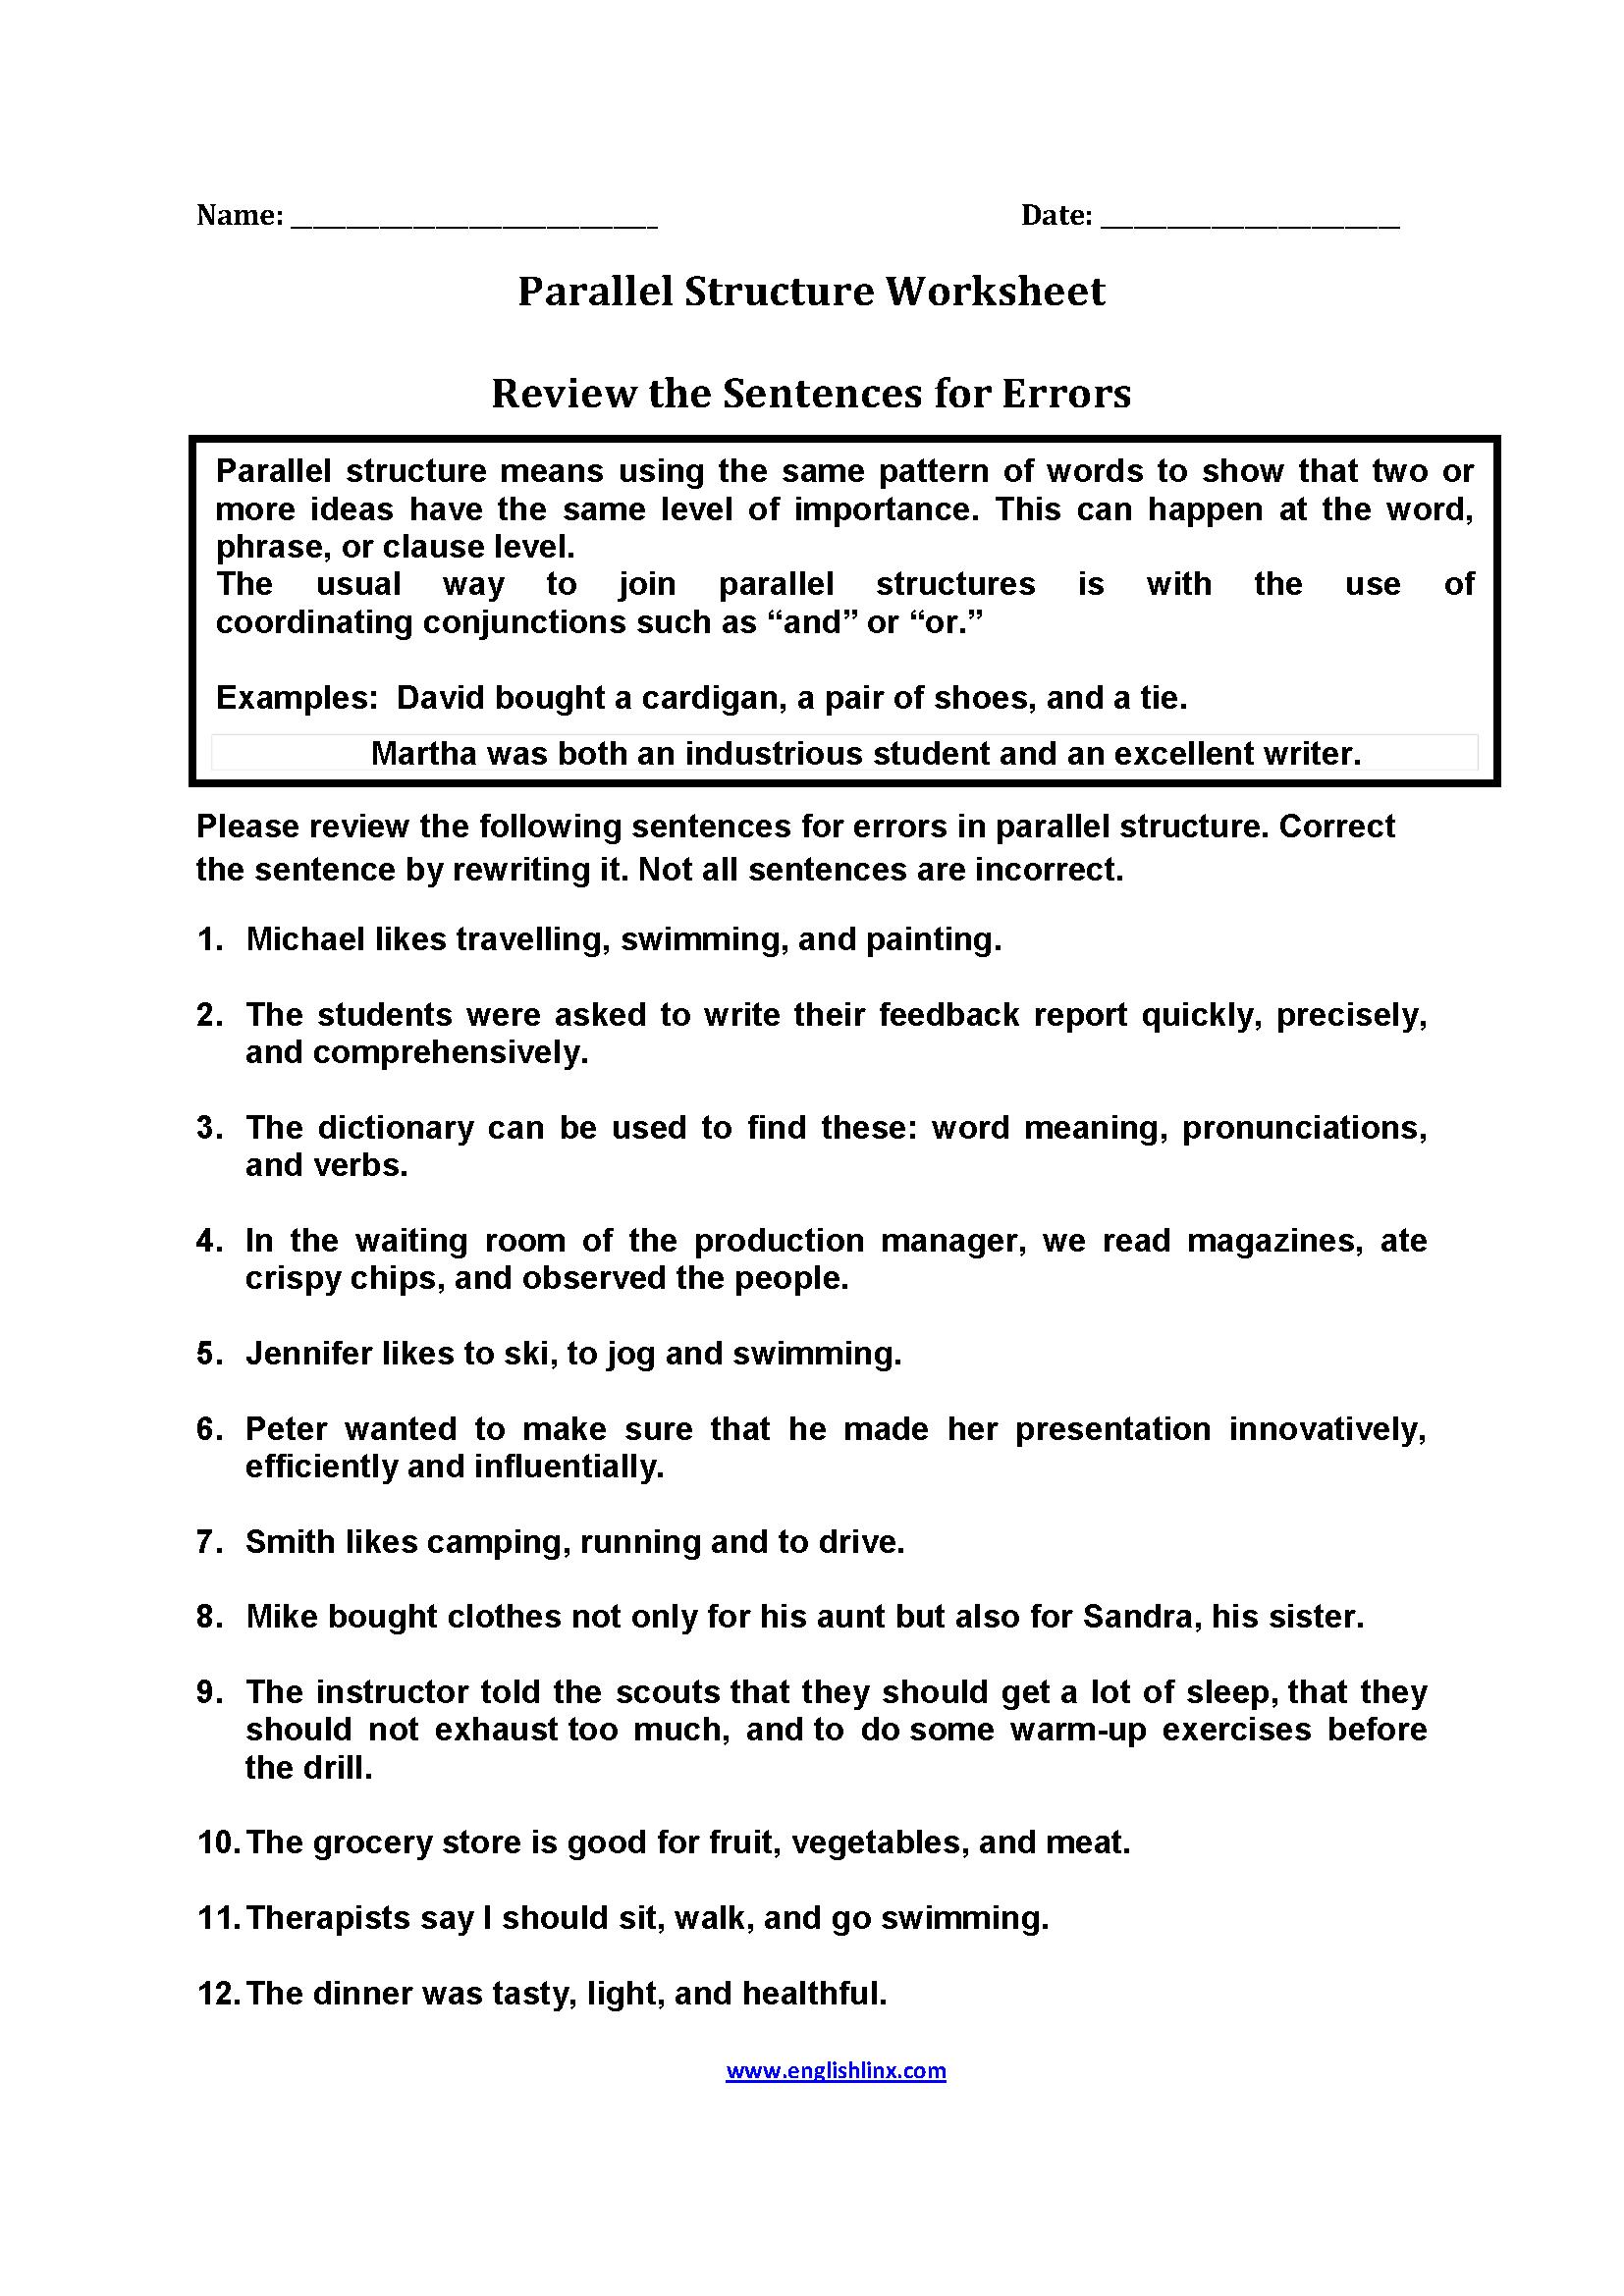 medium resolution of Parallel Structure Worksheets   Parallelism grammar